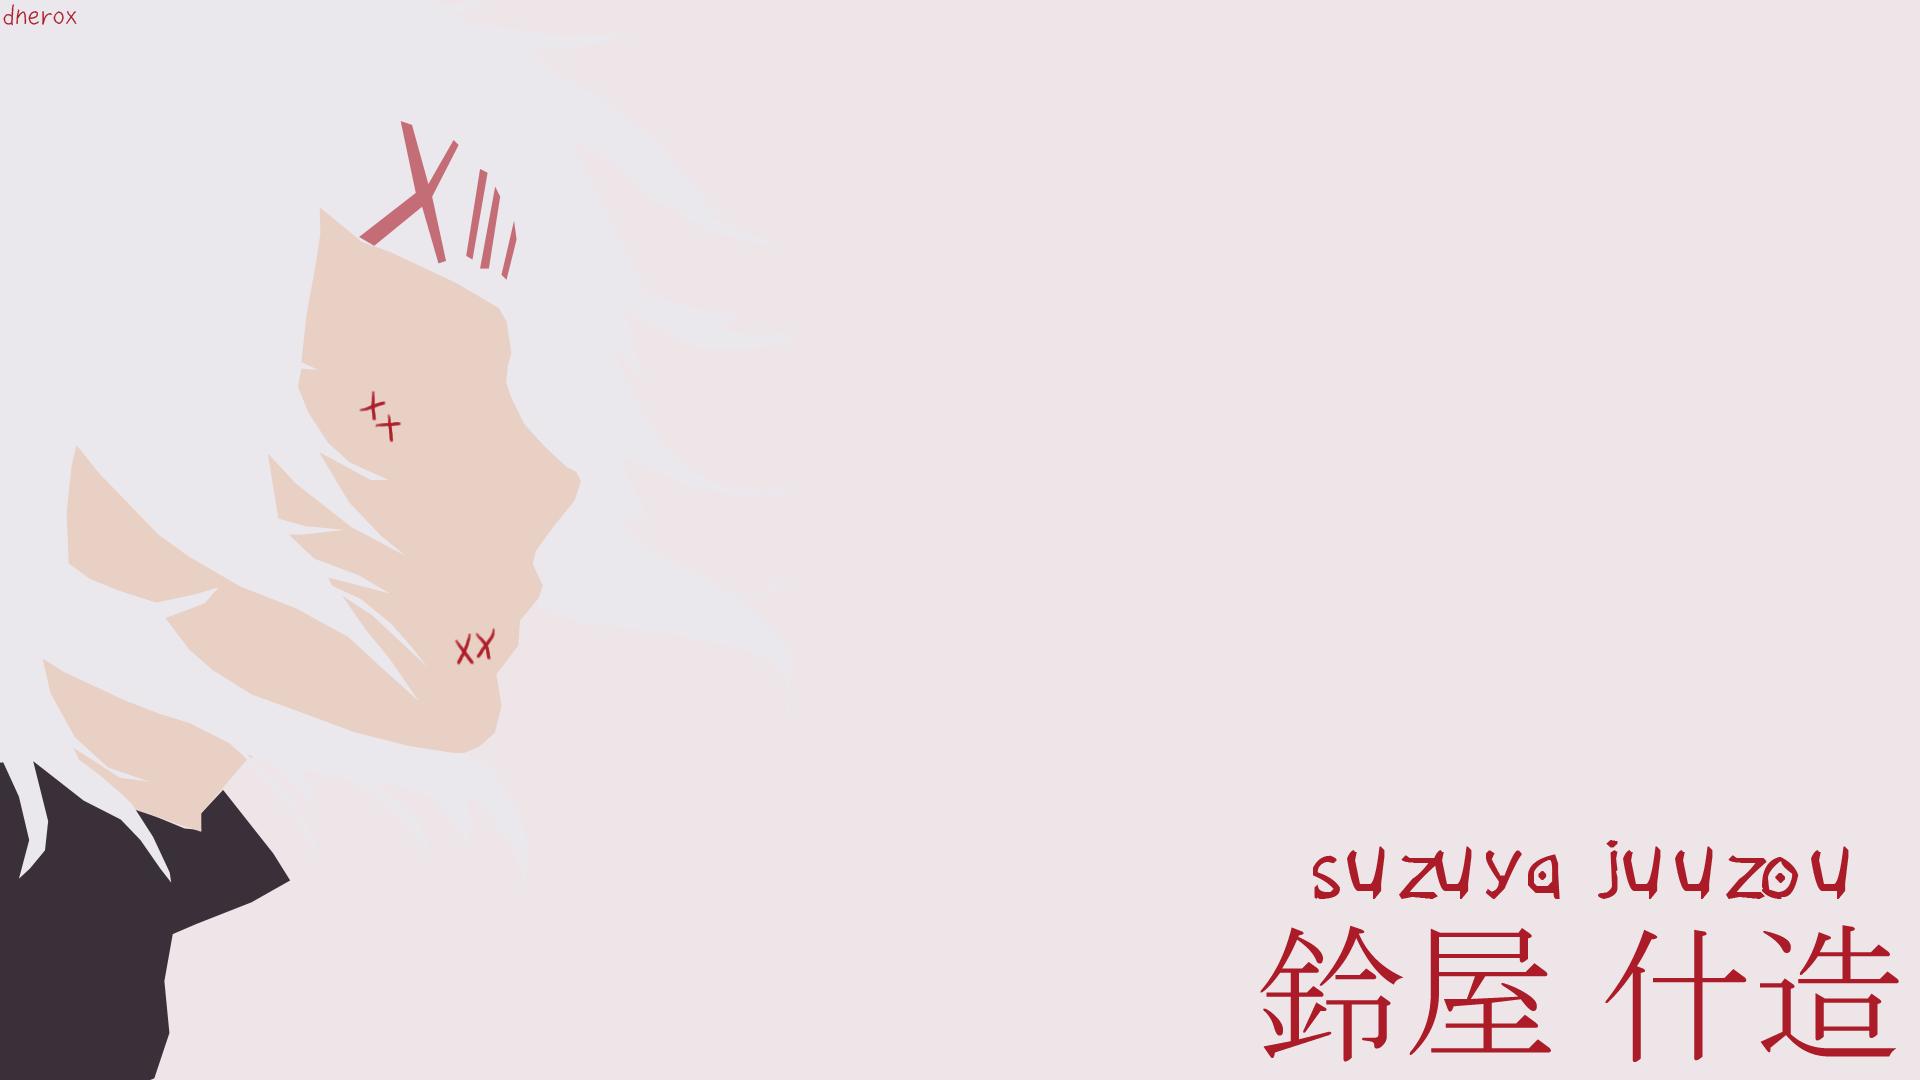 Suzuya Juuzou Minimalist Wallpaper By Dnerox On Deviantart